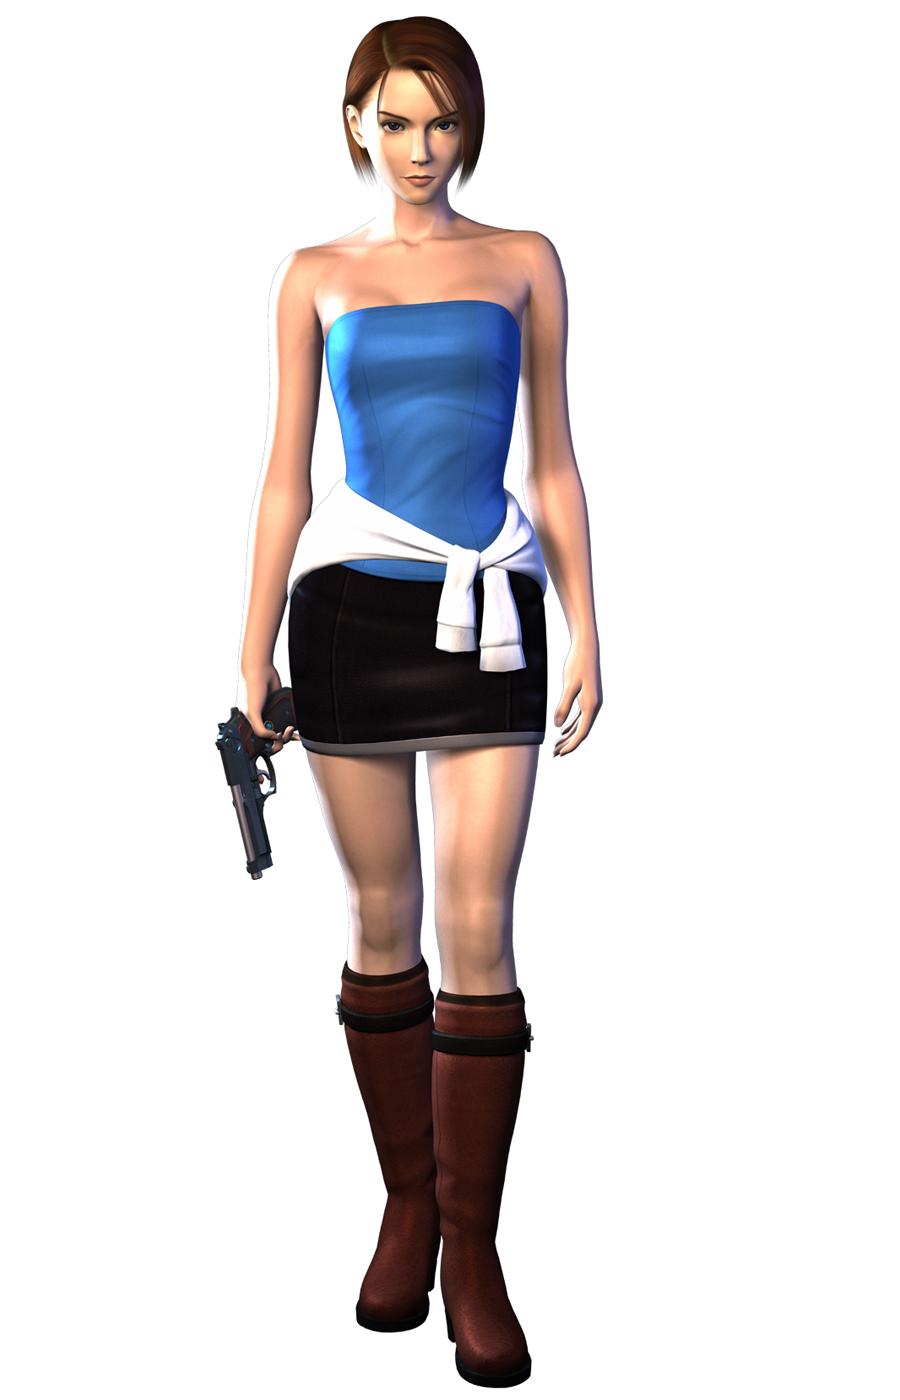 Lara croft impregnation nackt pic